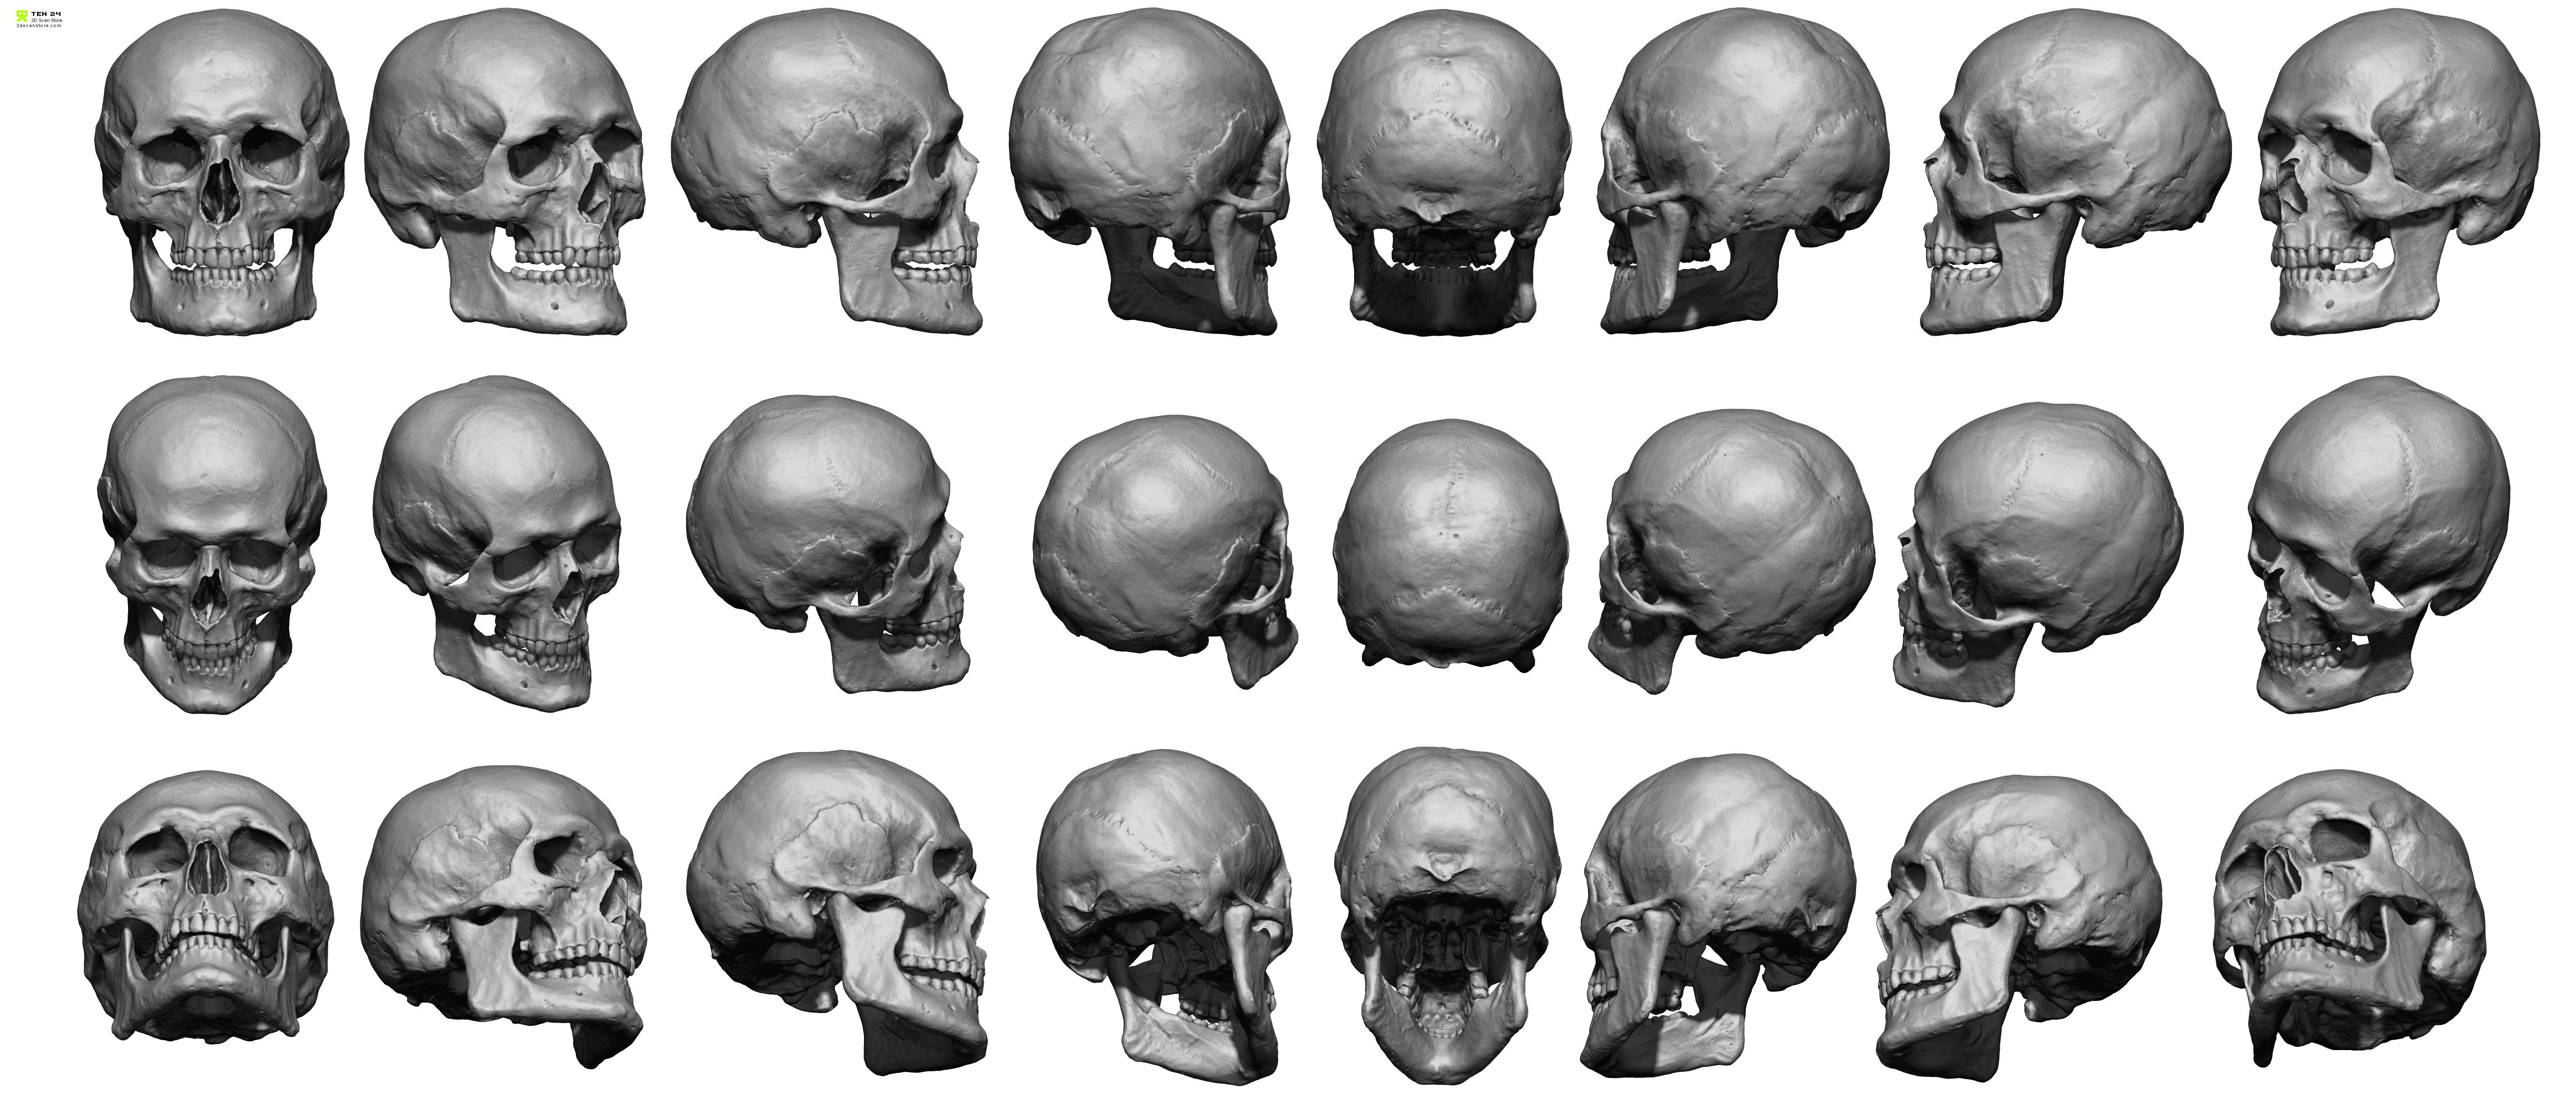 anatomy skull tutorial drawing - Google Search | Anatomy | Pinterest ...